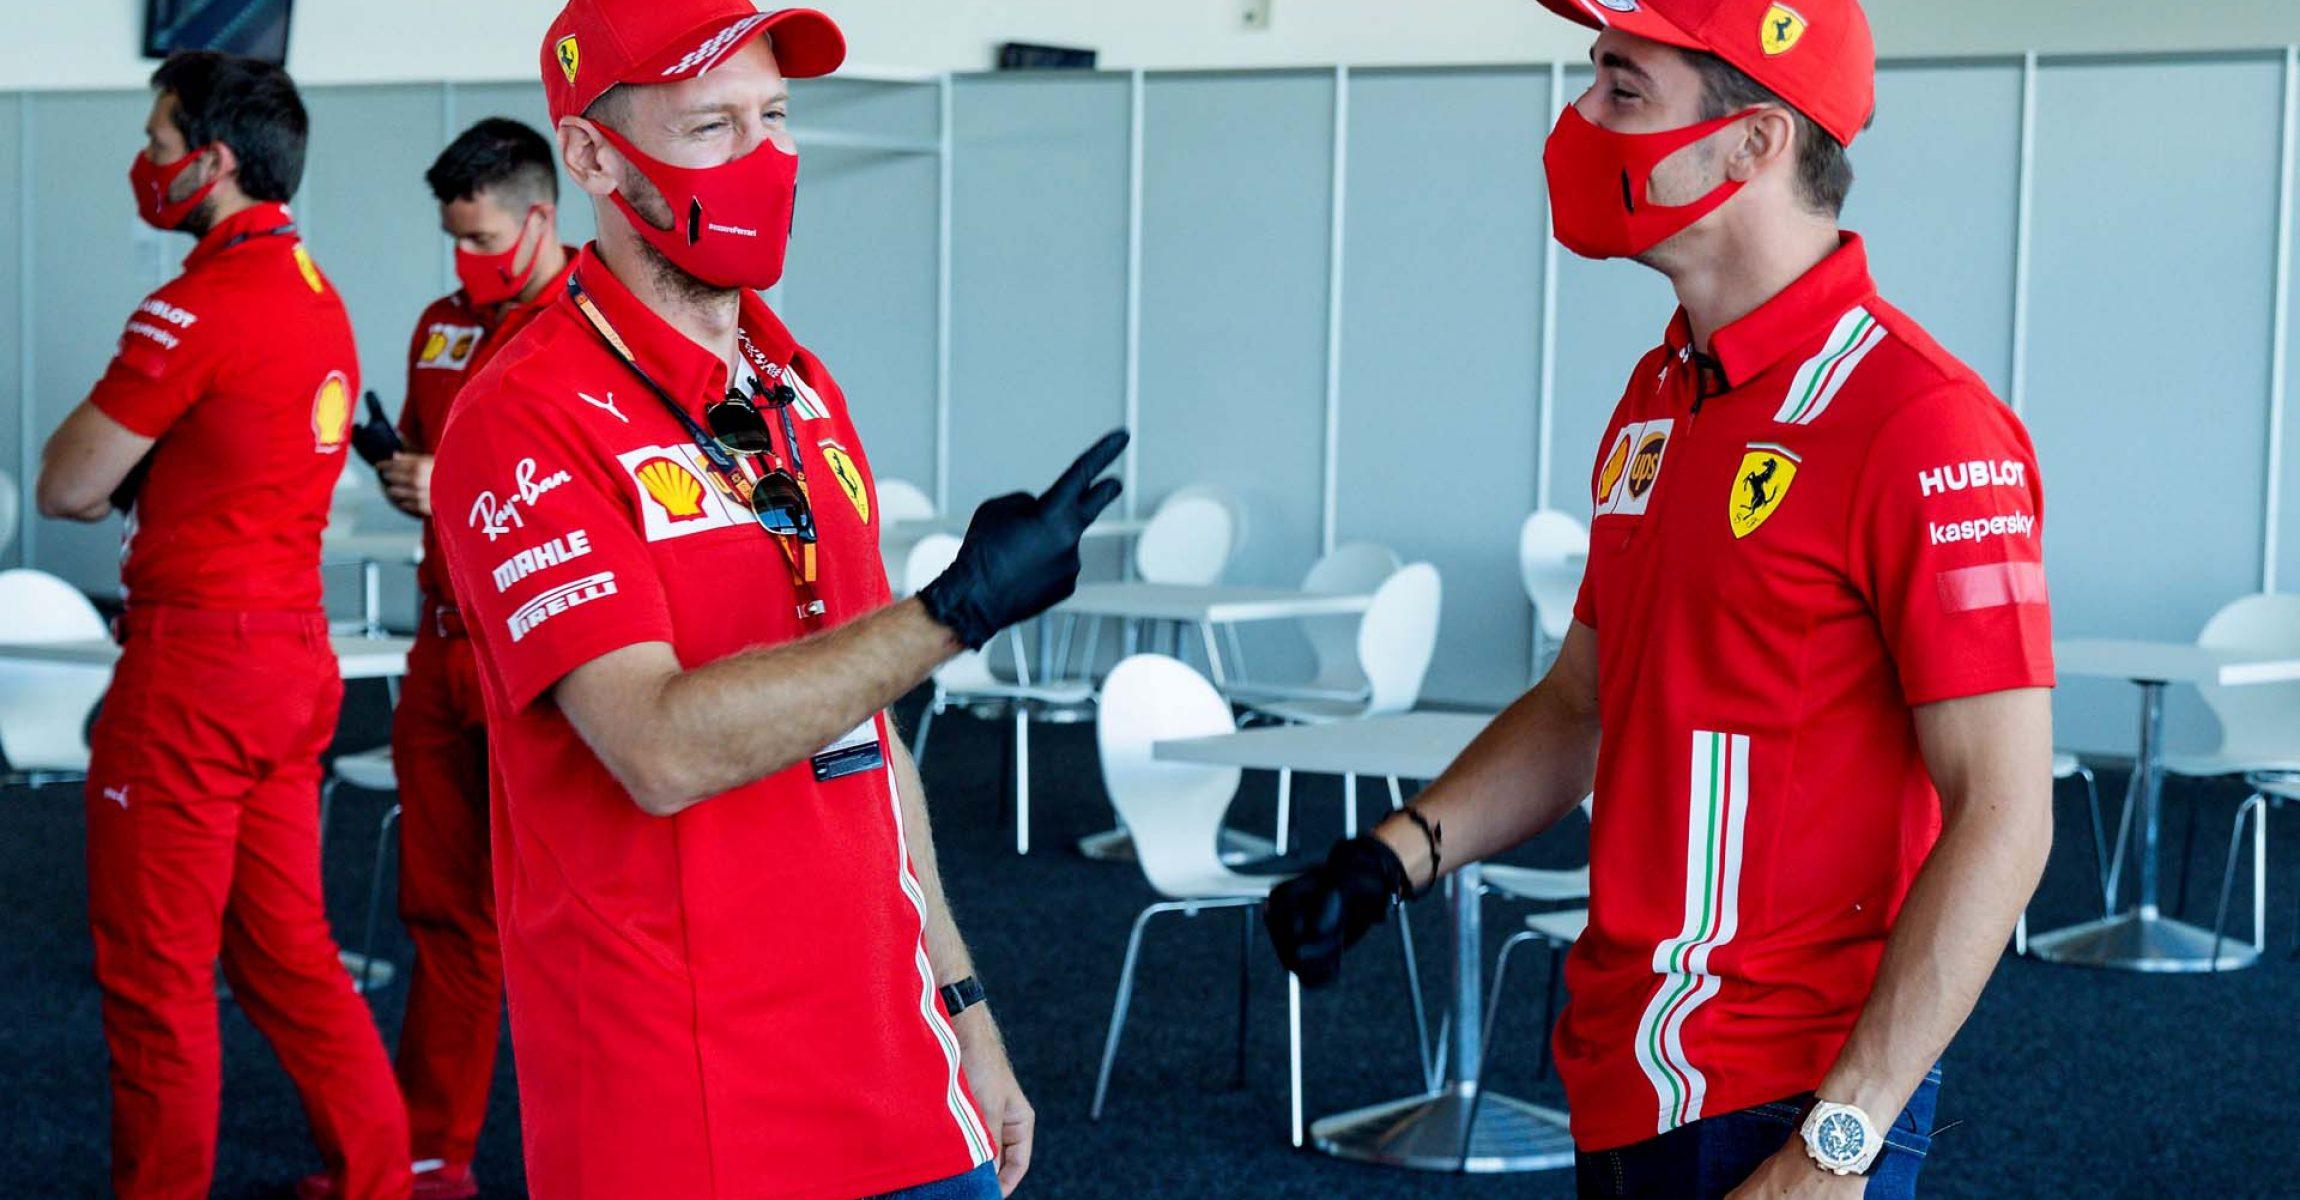 GP GRAN BRETAGNA  F1/2020 -  GIOVEDÌ 30/07/2020    credit: @Scuderia Ferrari Press Office Charles Leclerc Sebastian Vettel